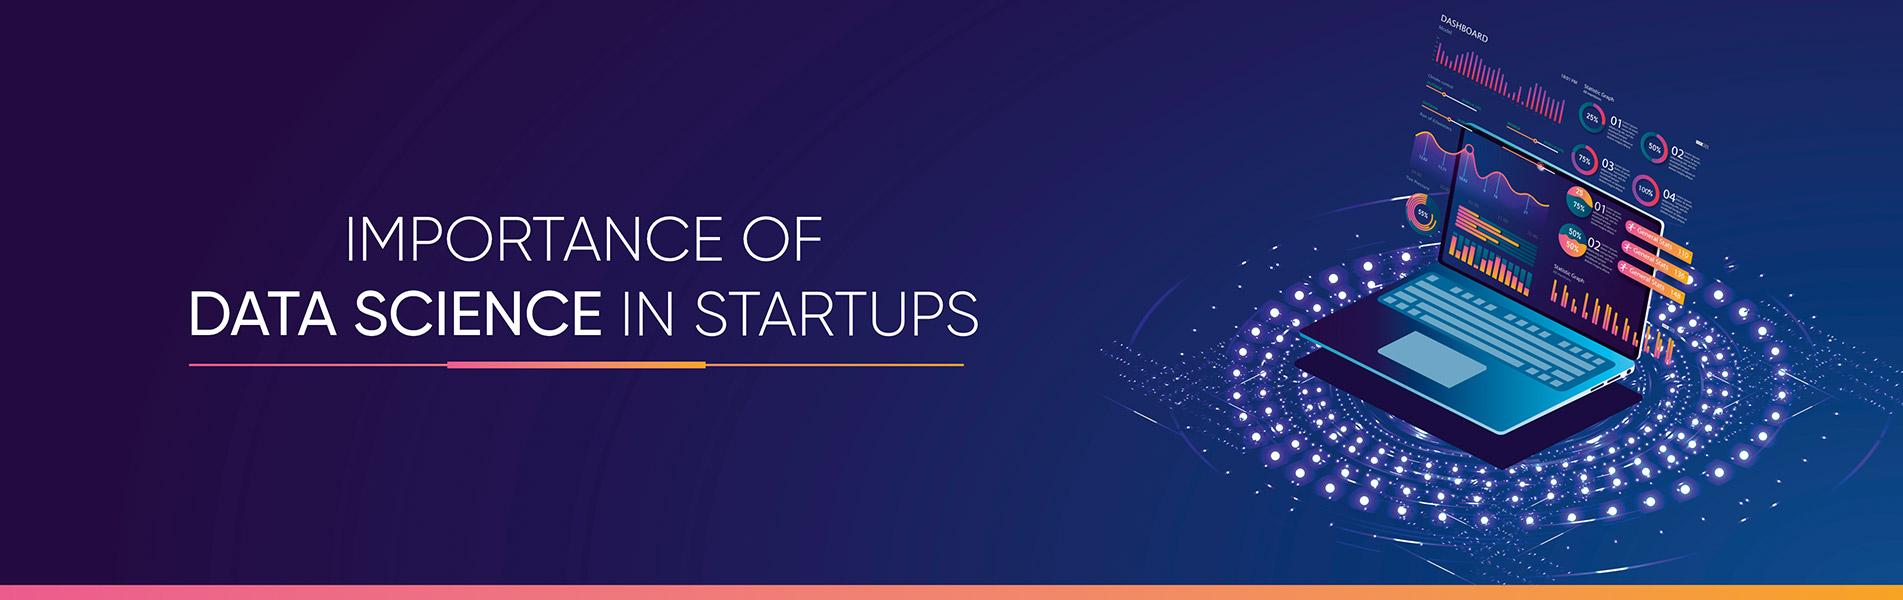 Data science, Startups